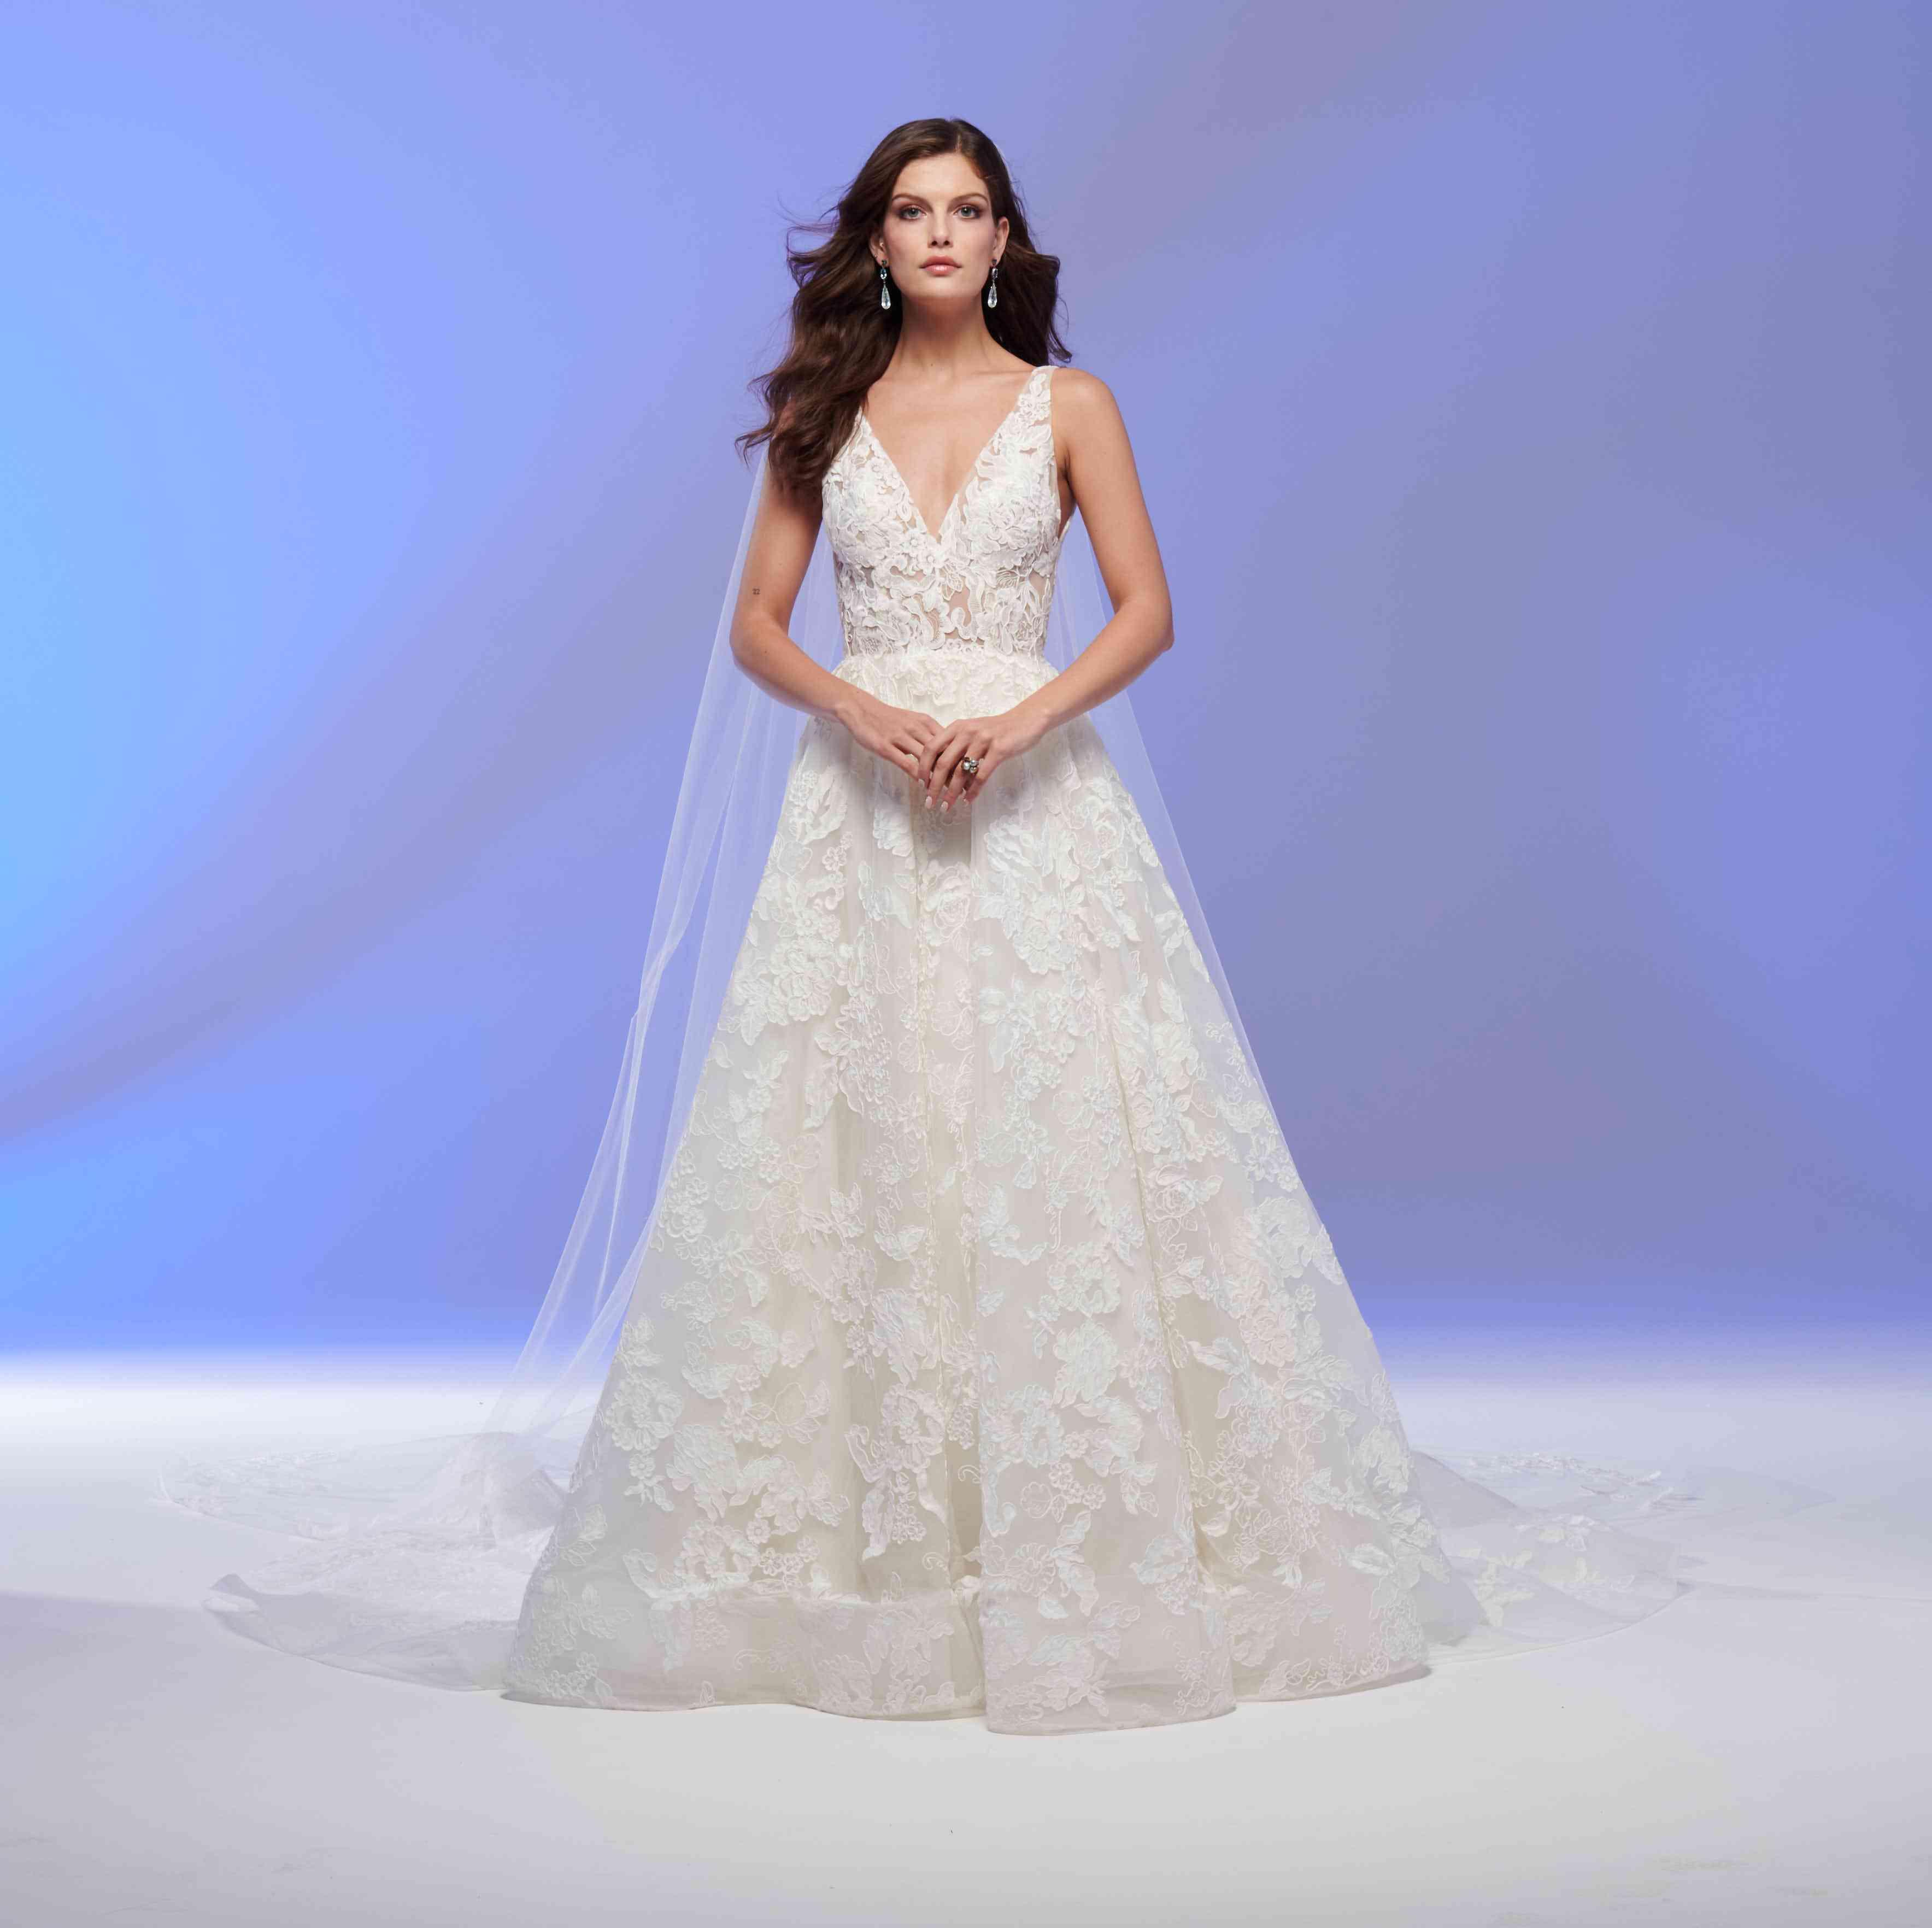 Geneva deep V-cut wedding dress